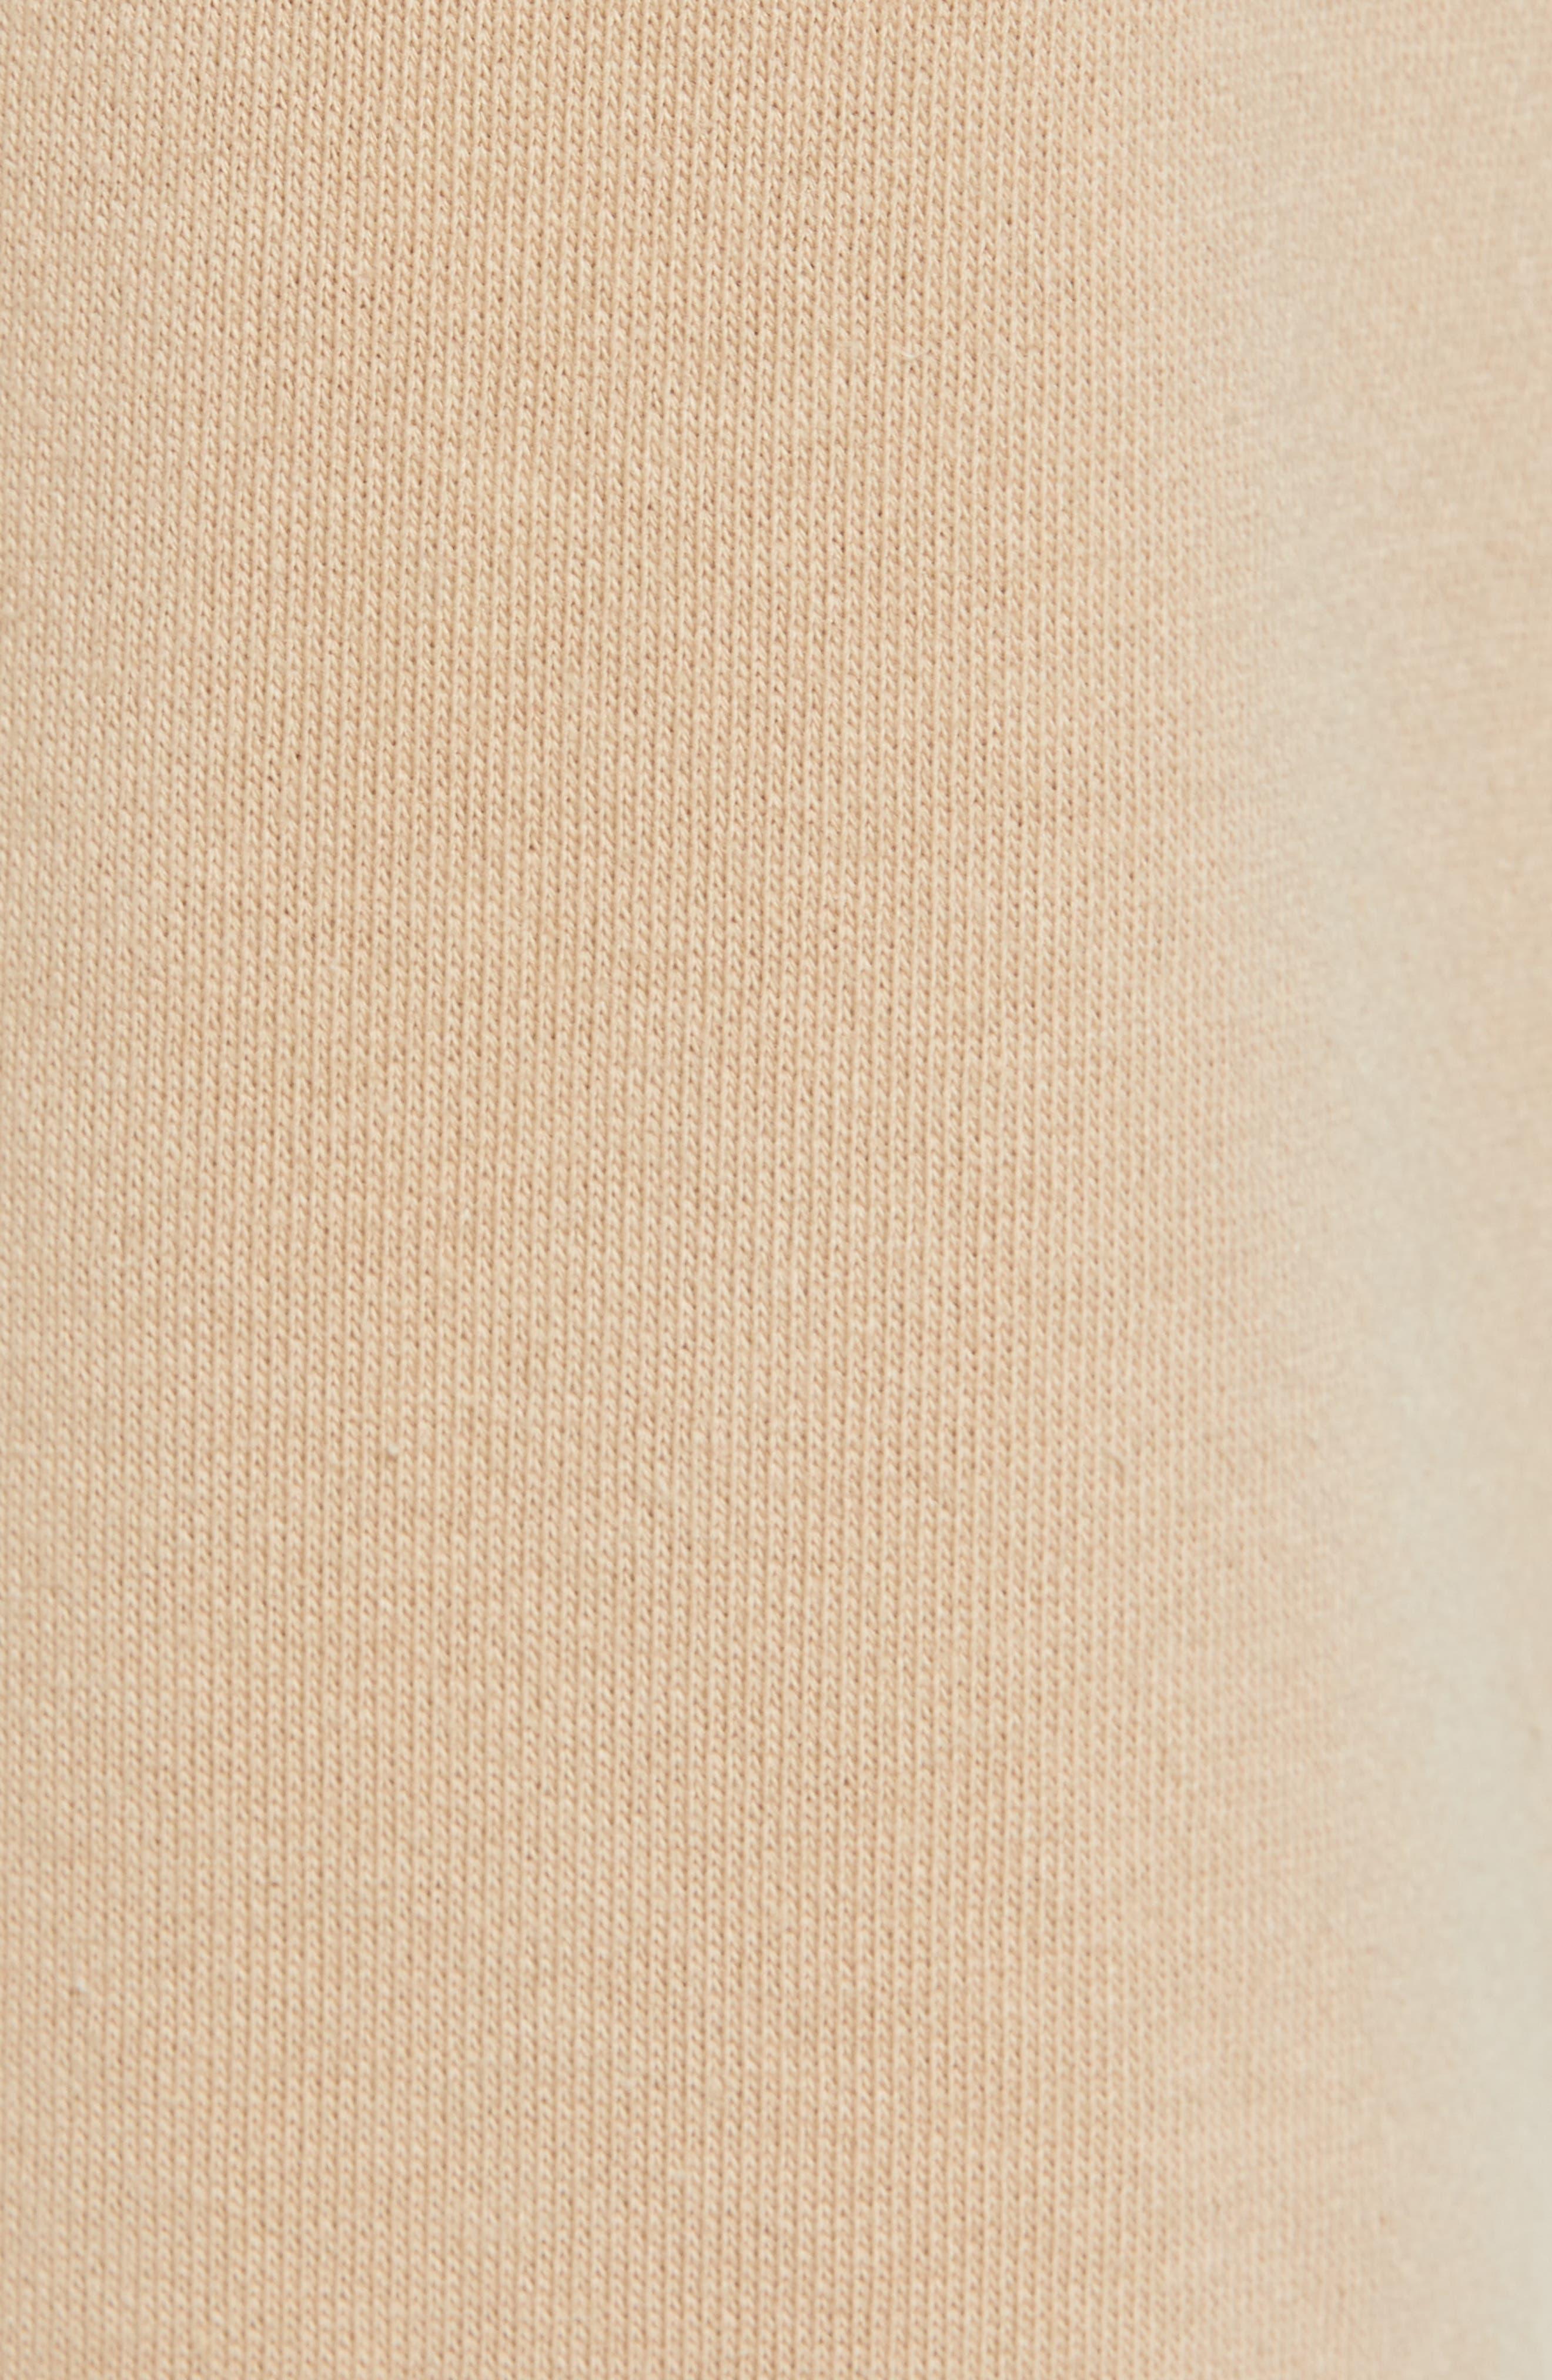 Terry Drawstring Shorts,                             Alternate thumbnail 6, color,                             Tan Safari